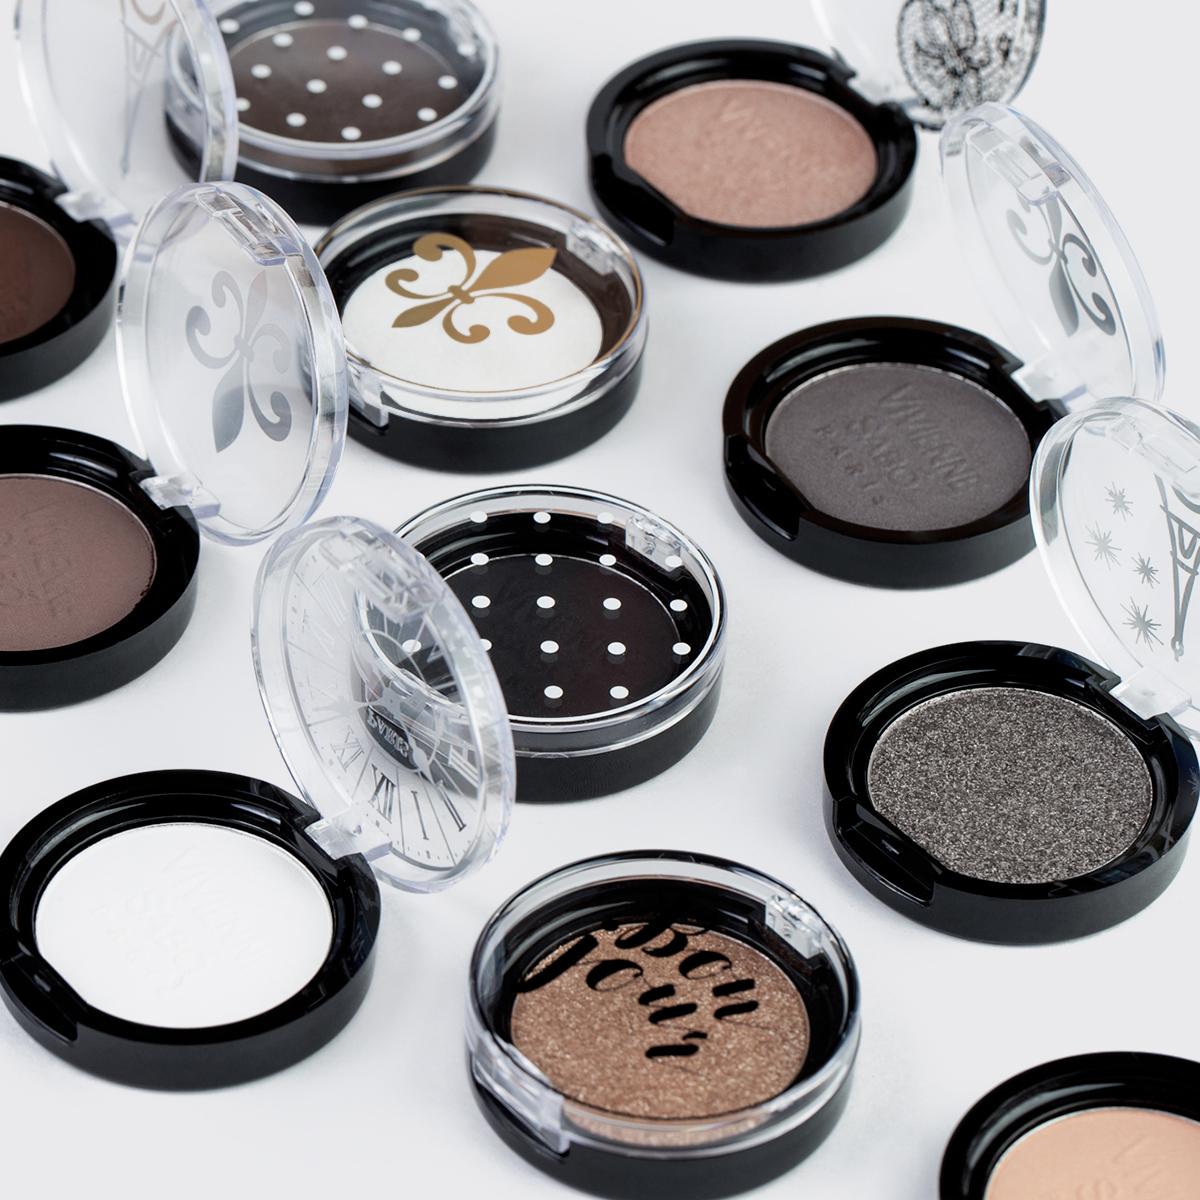 Vivienne Sabo - Sparkling Mono Eyeshadow Petits Jeux